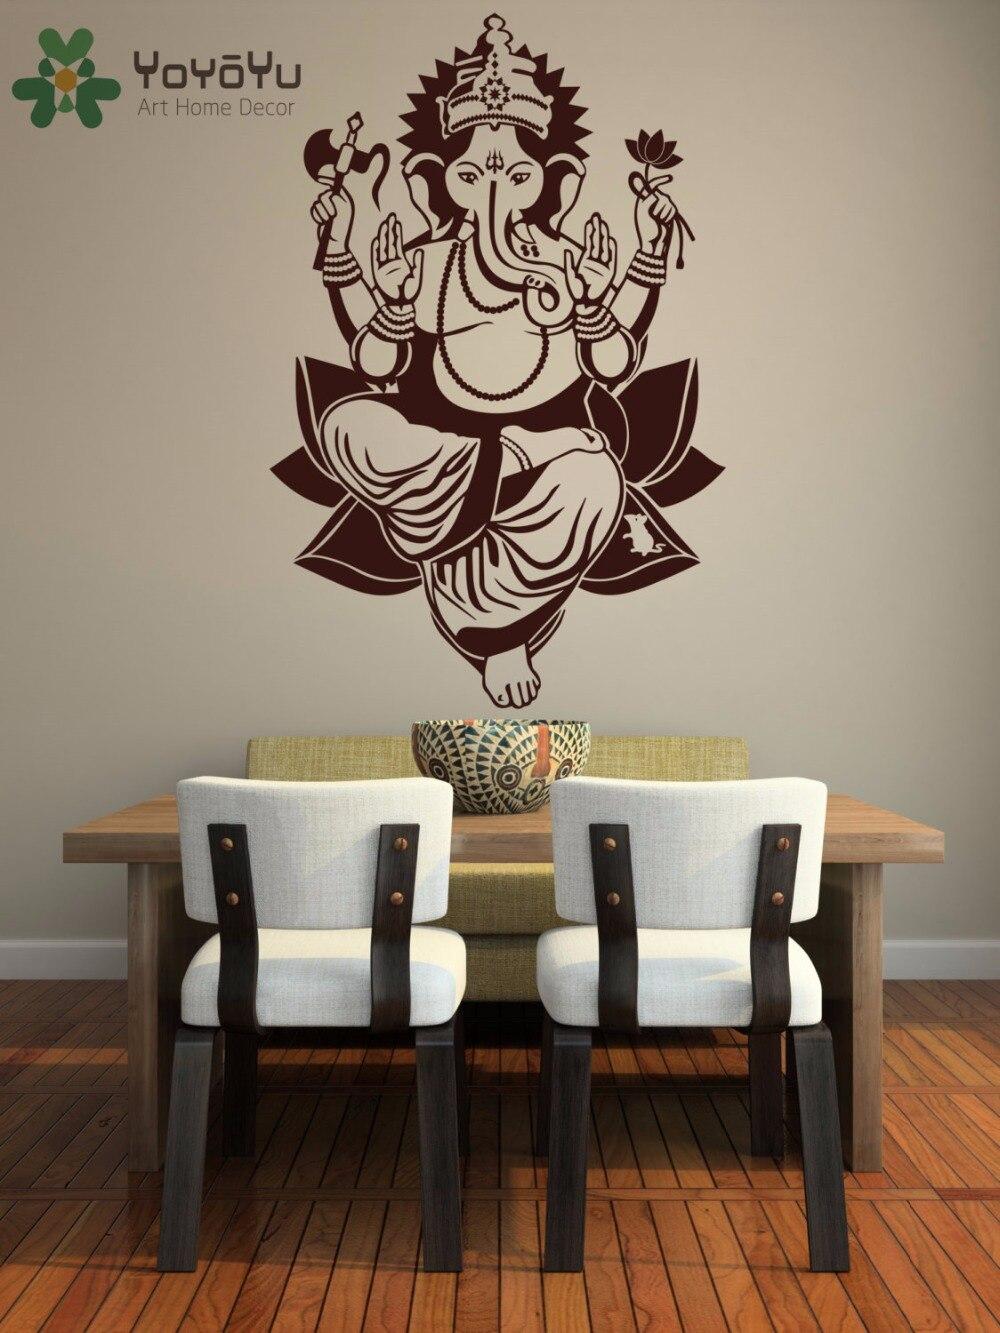 Humor New Ganesha Elephant Buddha Mandala Yoga Wall Stickers Diy Home Decor Vinyl Wall Decals For Living Room Pvc Waterproof Removable Wall Stickers